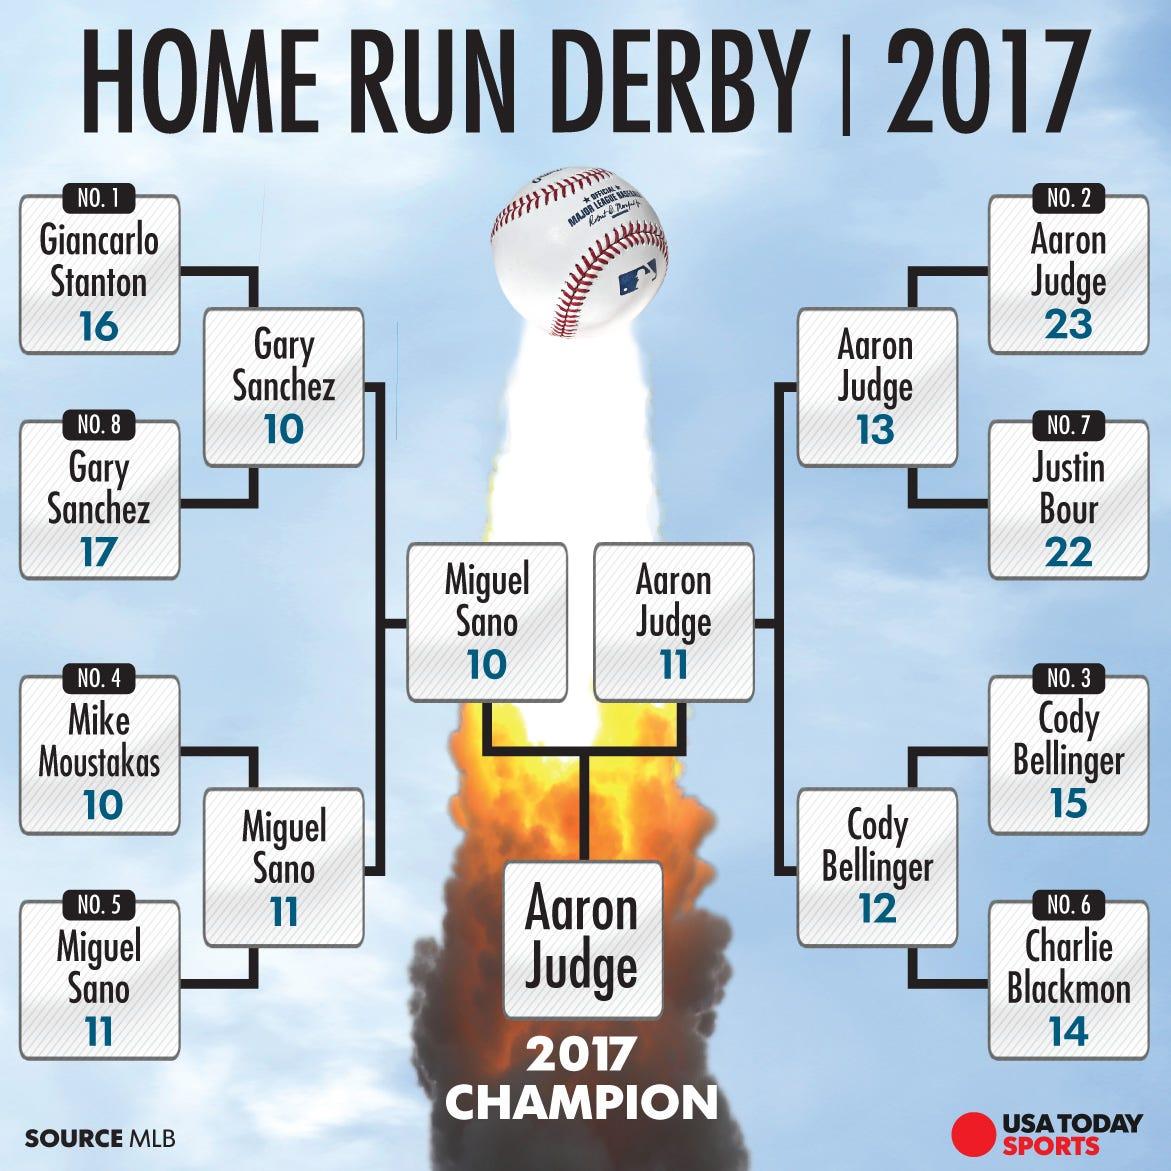 ff22d8543 Aaron Judge wins 2017 Home Run Derby